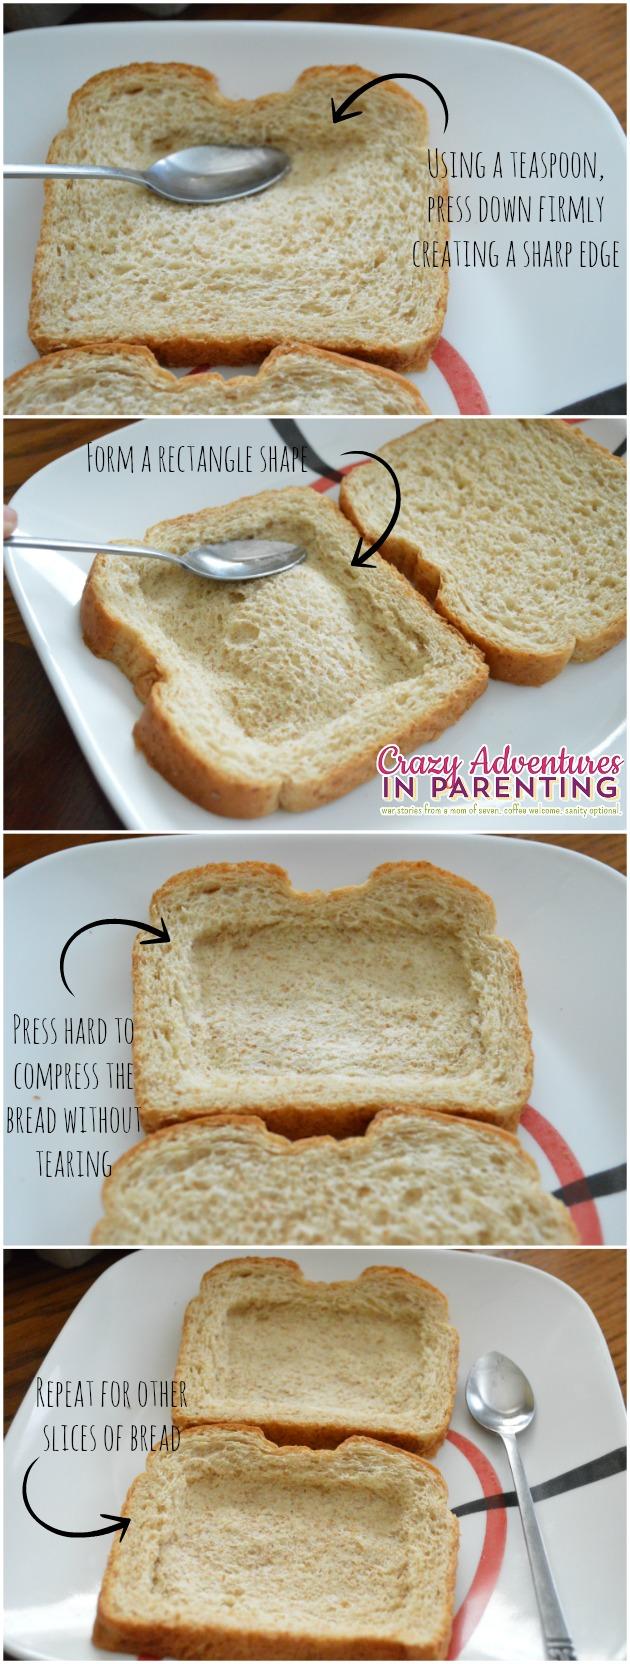 boterham sandwich